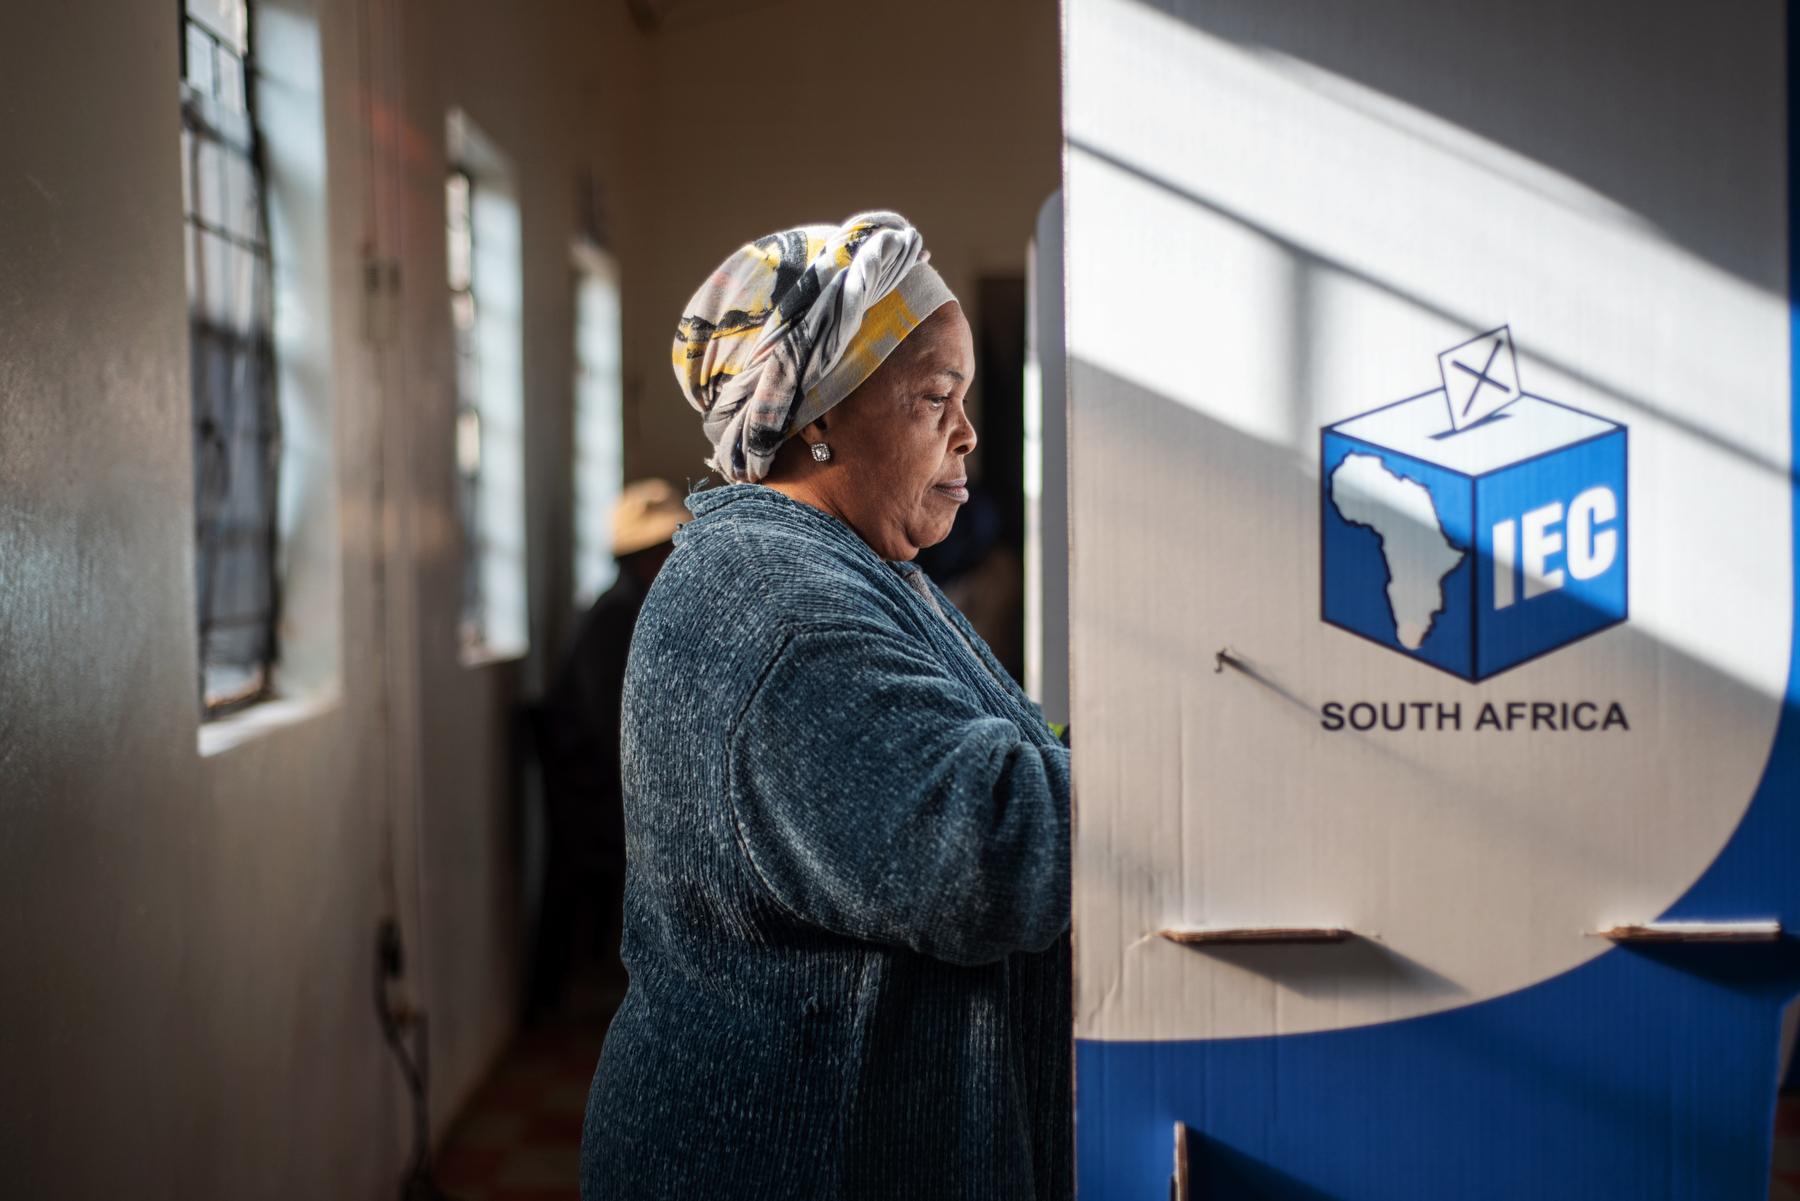 SAFRICA-VOTE